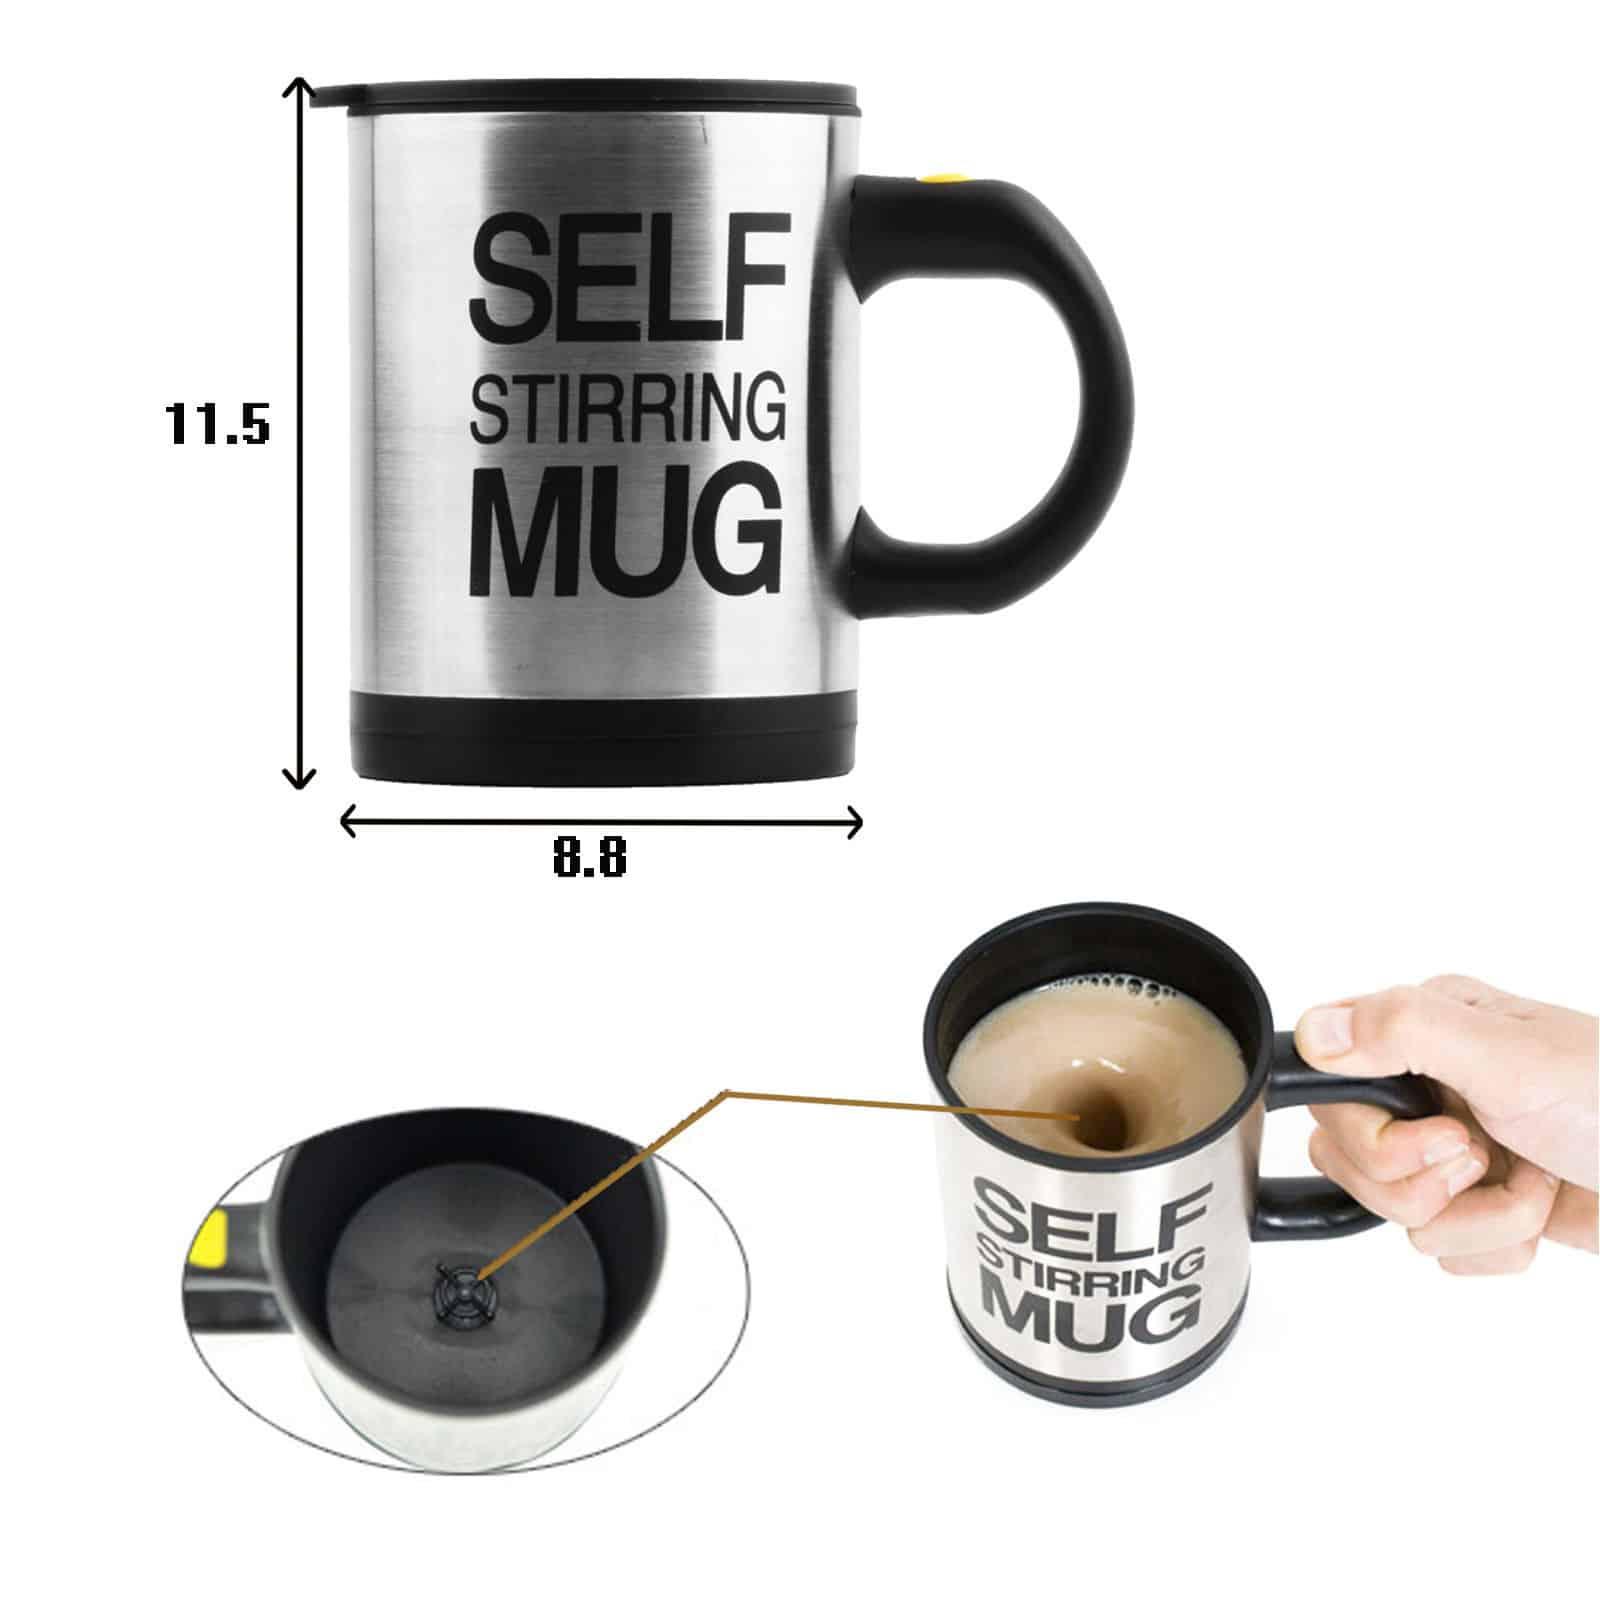 Self Stirring Mug Plain Lazy Mug Auto Stir Cup Top